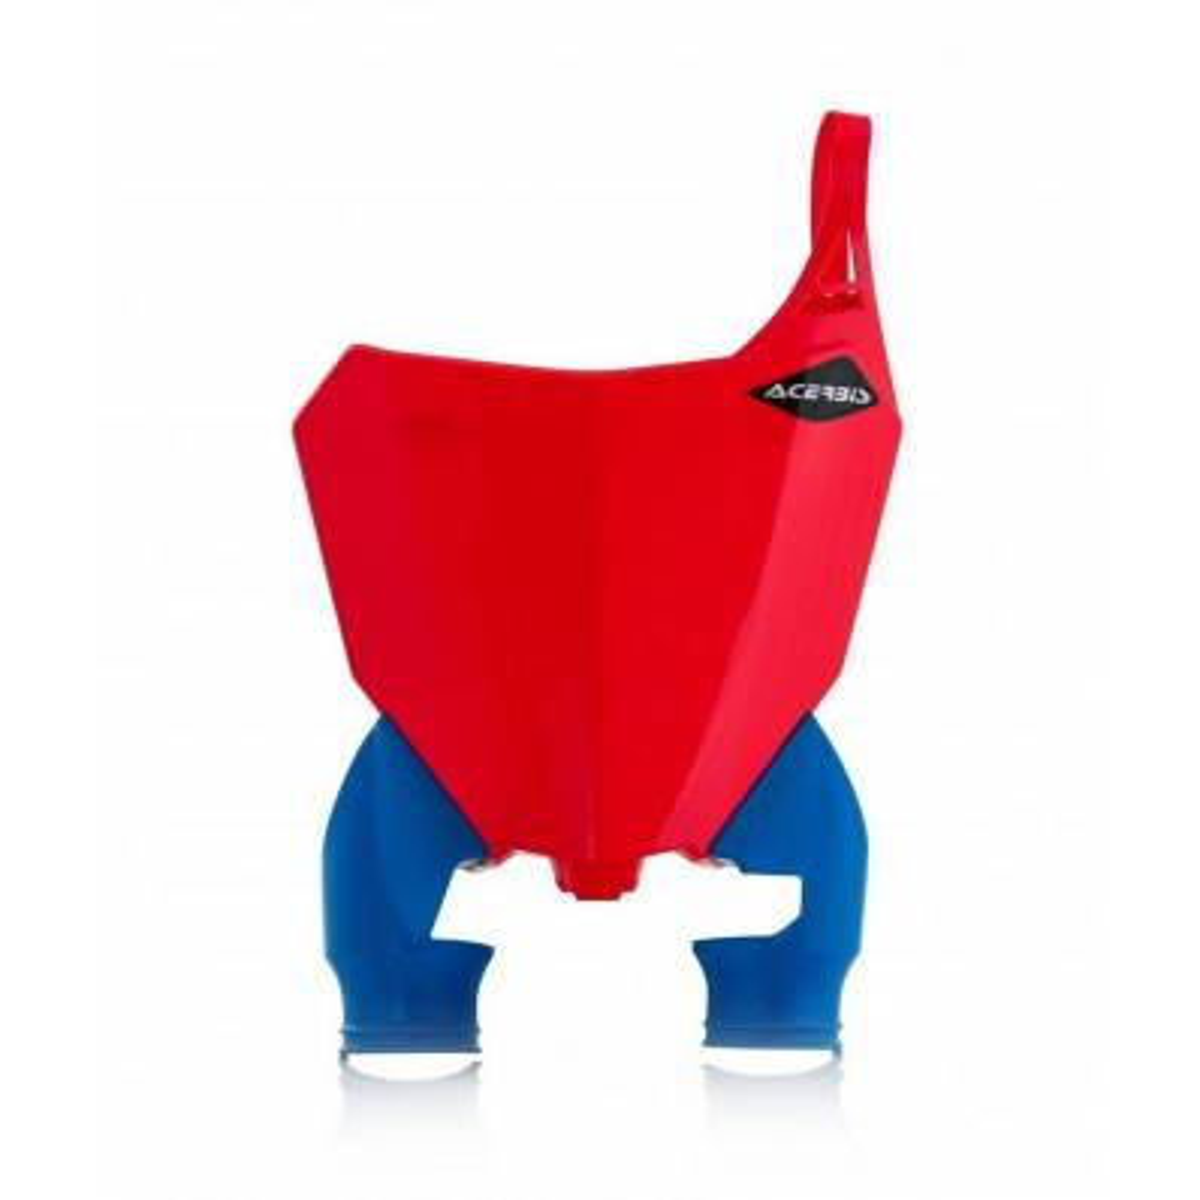 0022391-344 - Portanumero Delantero Raptor Crf250 18. 450 17 18 Rojo Azul